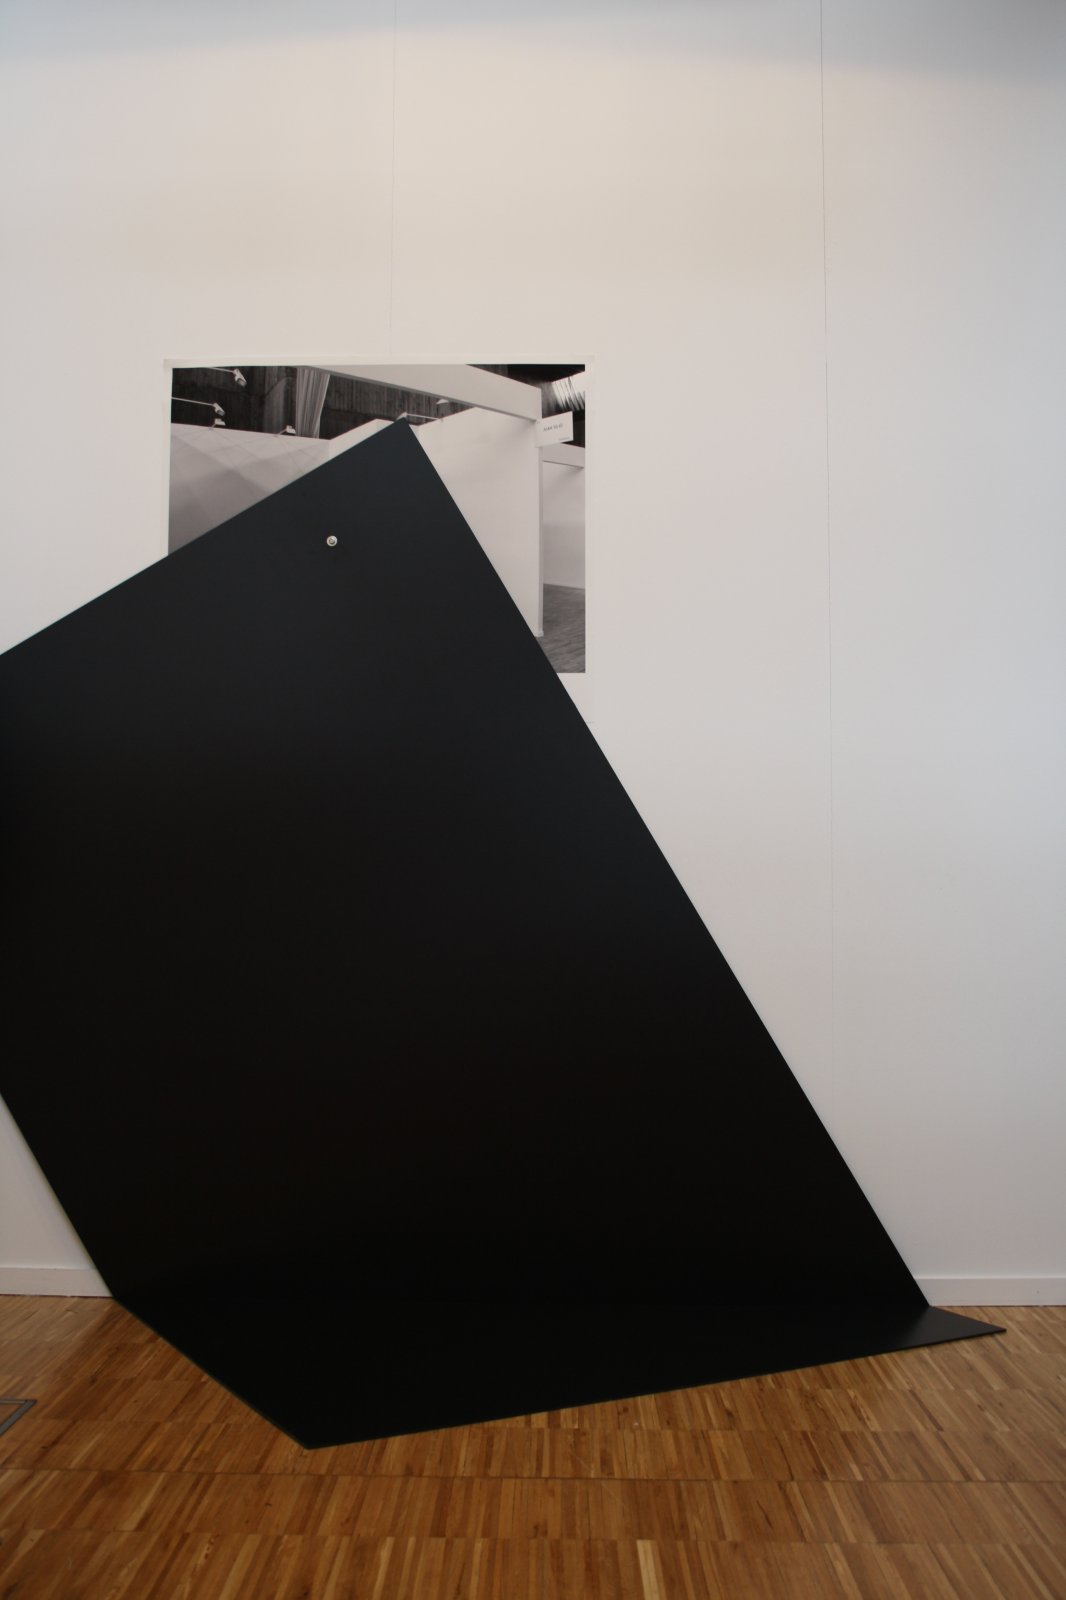 Obra de Santiago Giralda. Galería Moisés Pérez Albéniz.